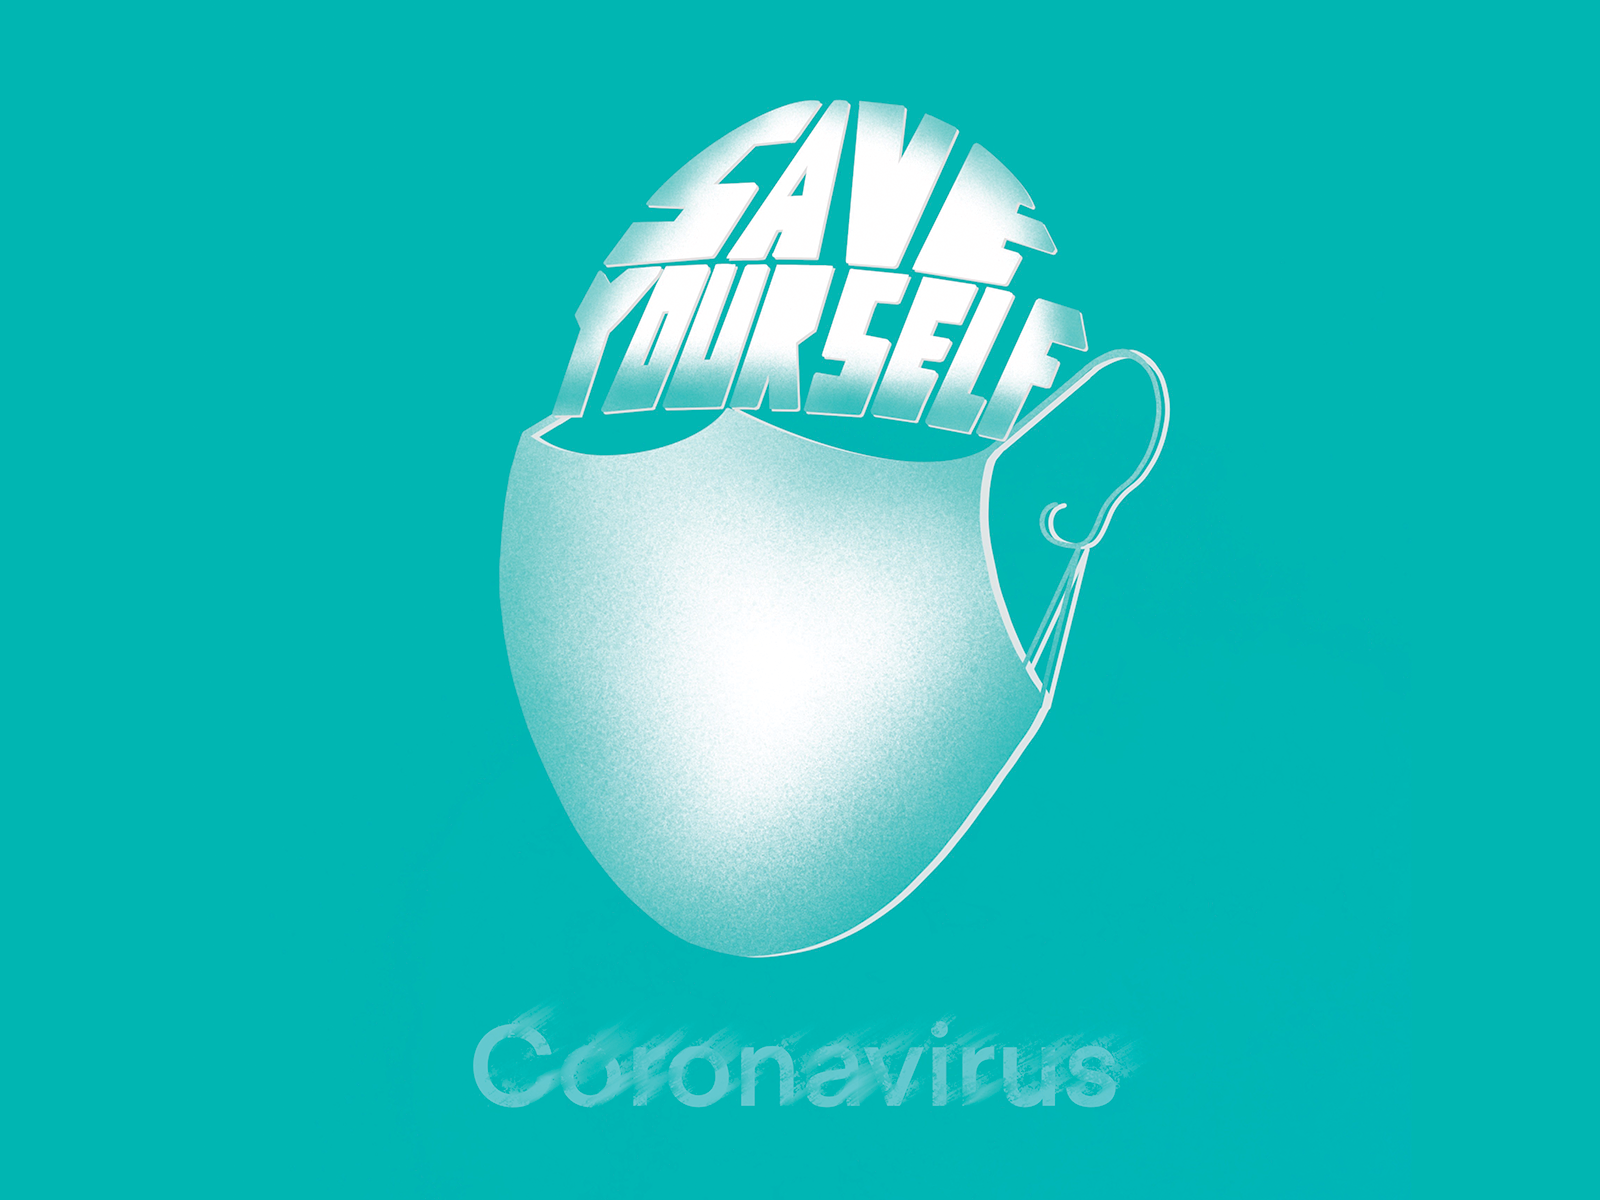 Coronavirus Self Protection Campaign By Ashvinth Premanantha On